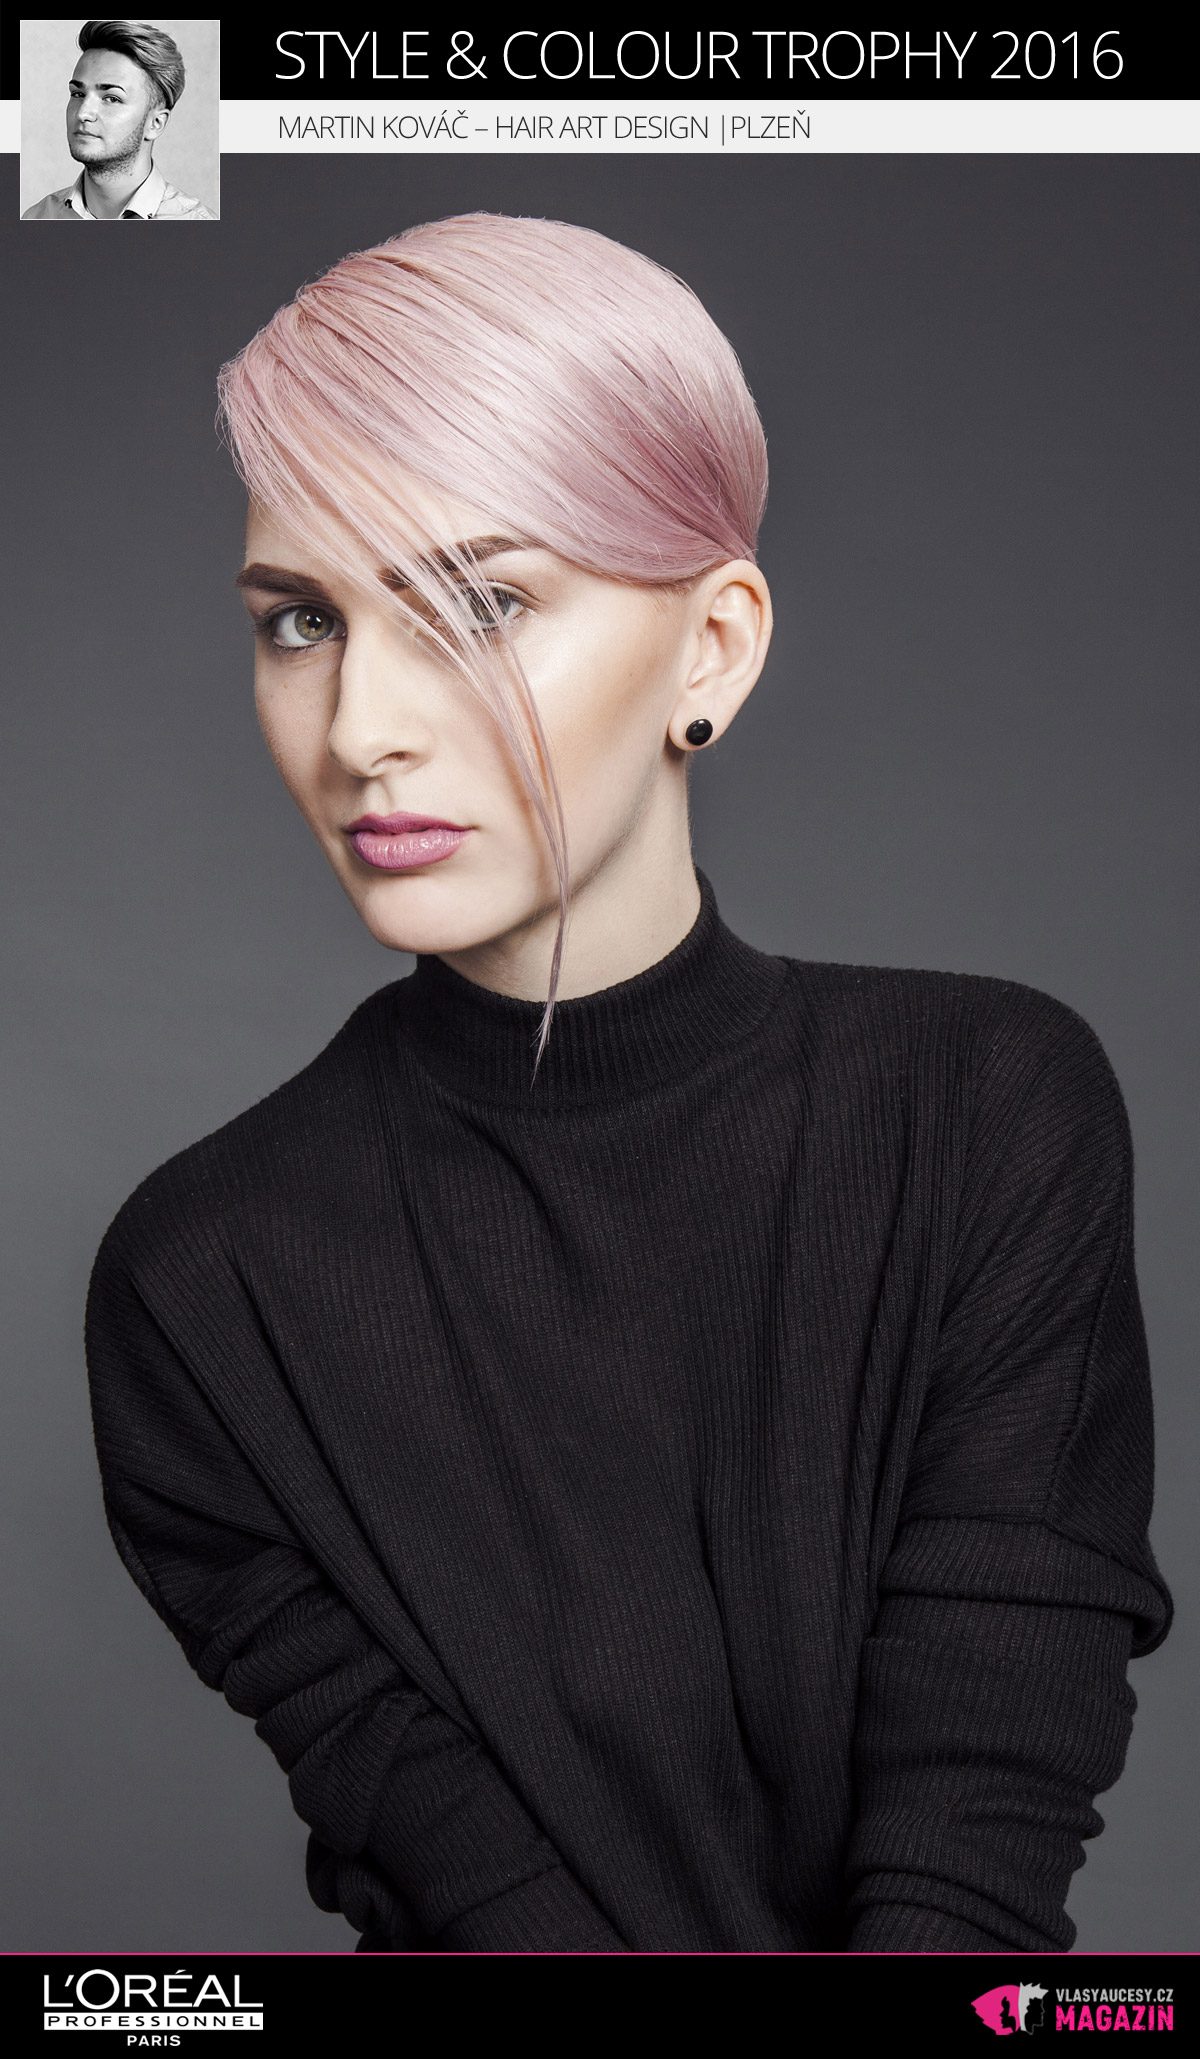 Martin Kováč –Hair Art Design, Plzeň | L'Oréal Style & Colour Trophy 2016